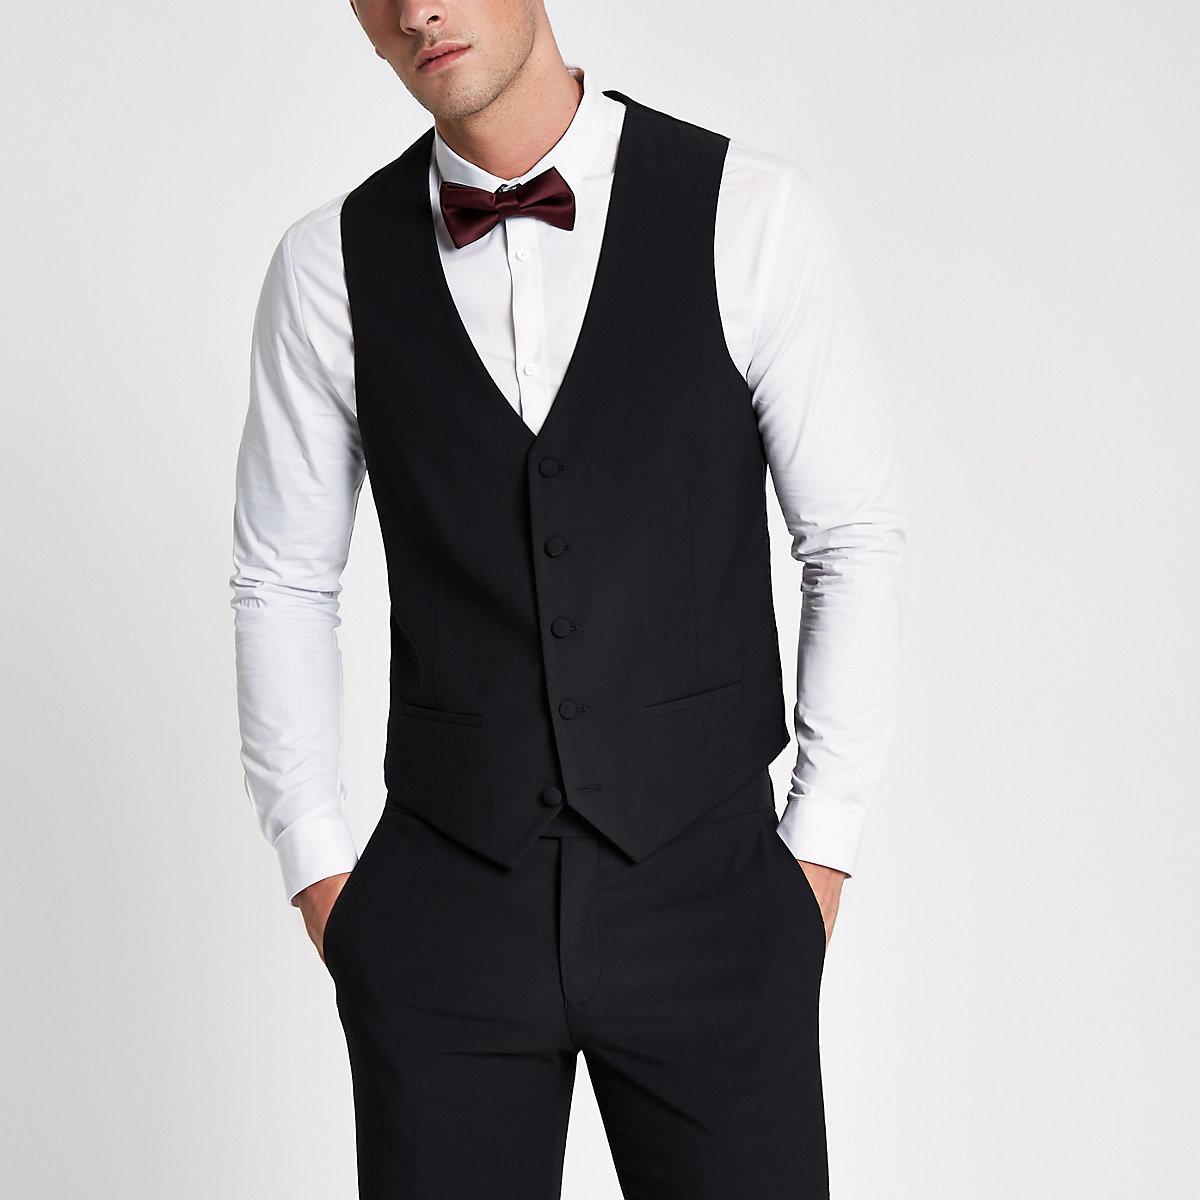 Gilet de costume noir